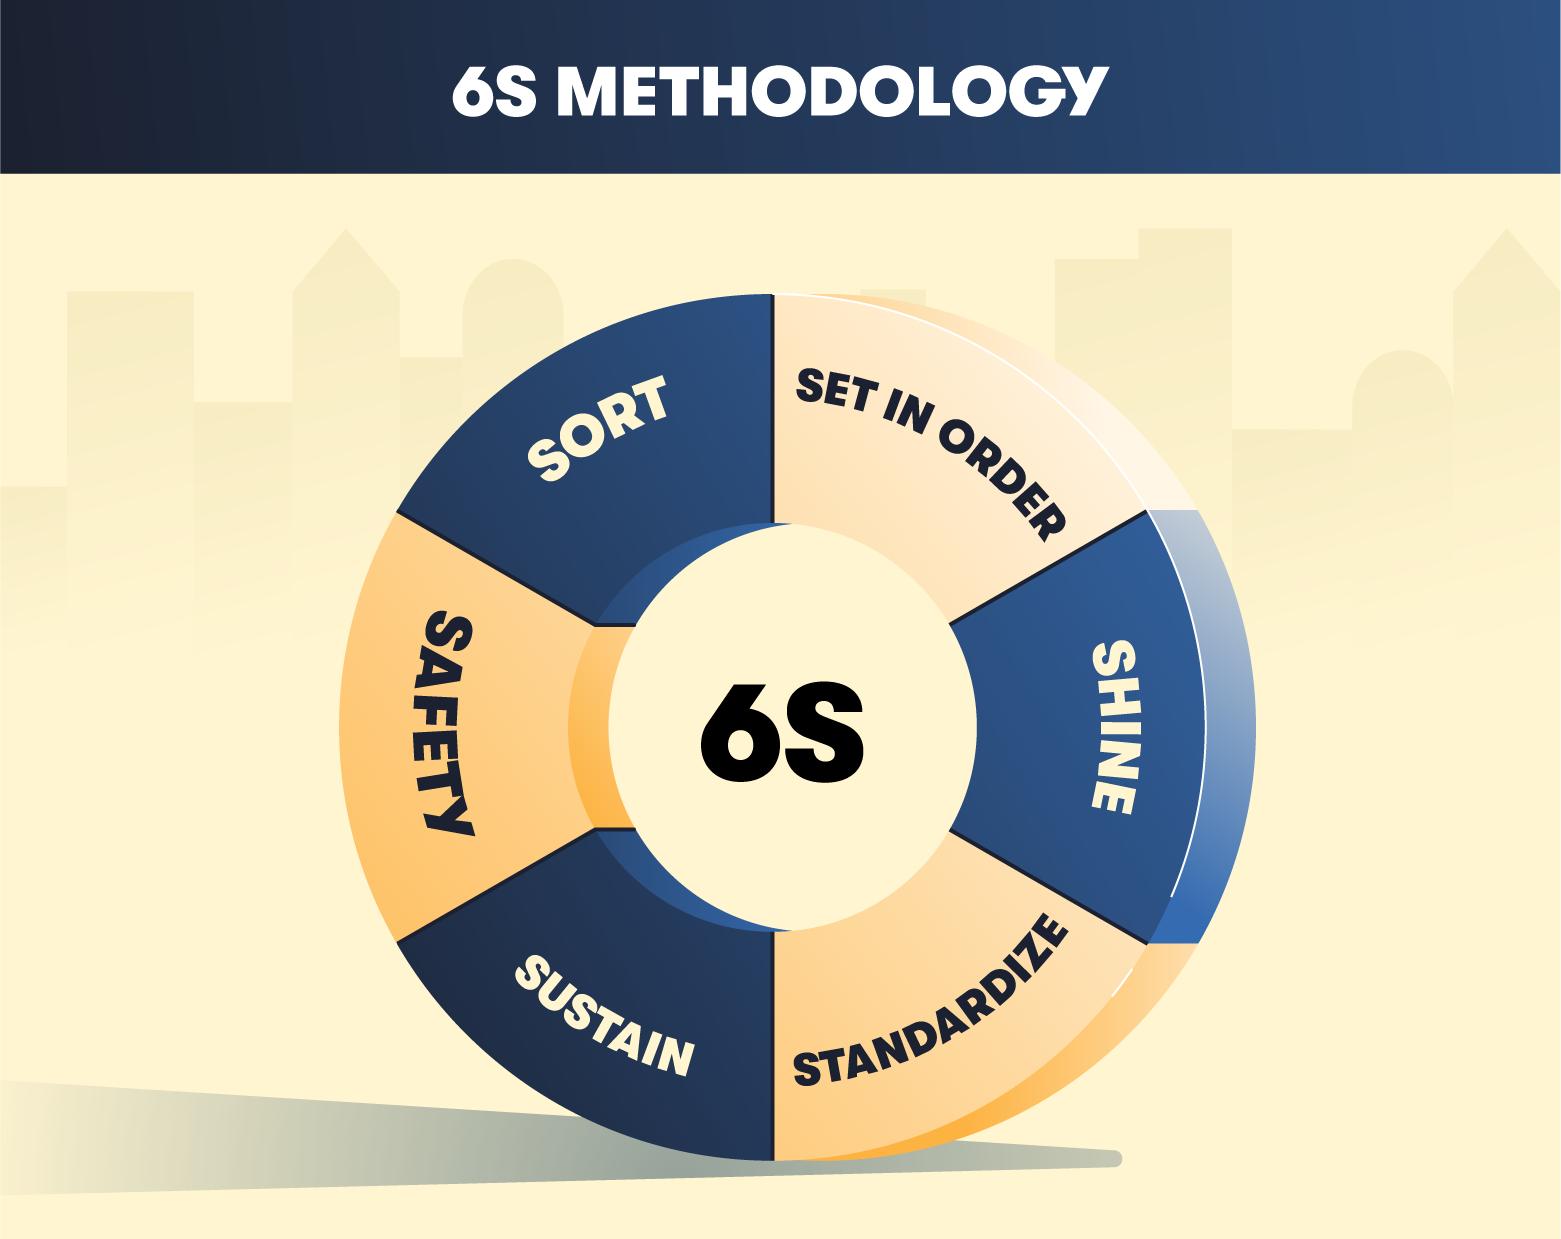 wheel describing 6s methodology: sort, set in order, shine, standardize, sustain, safety